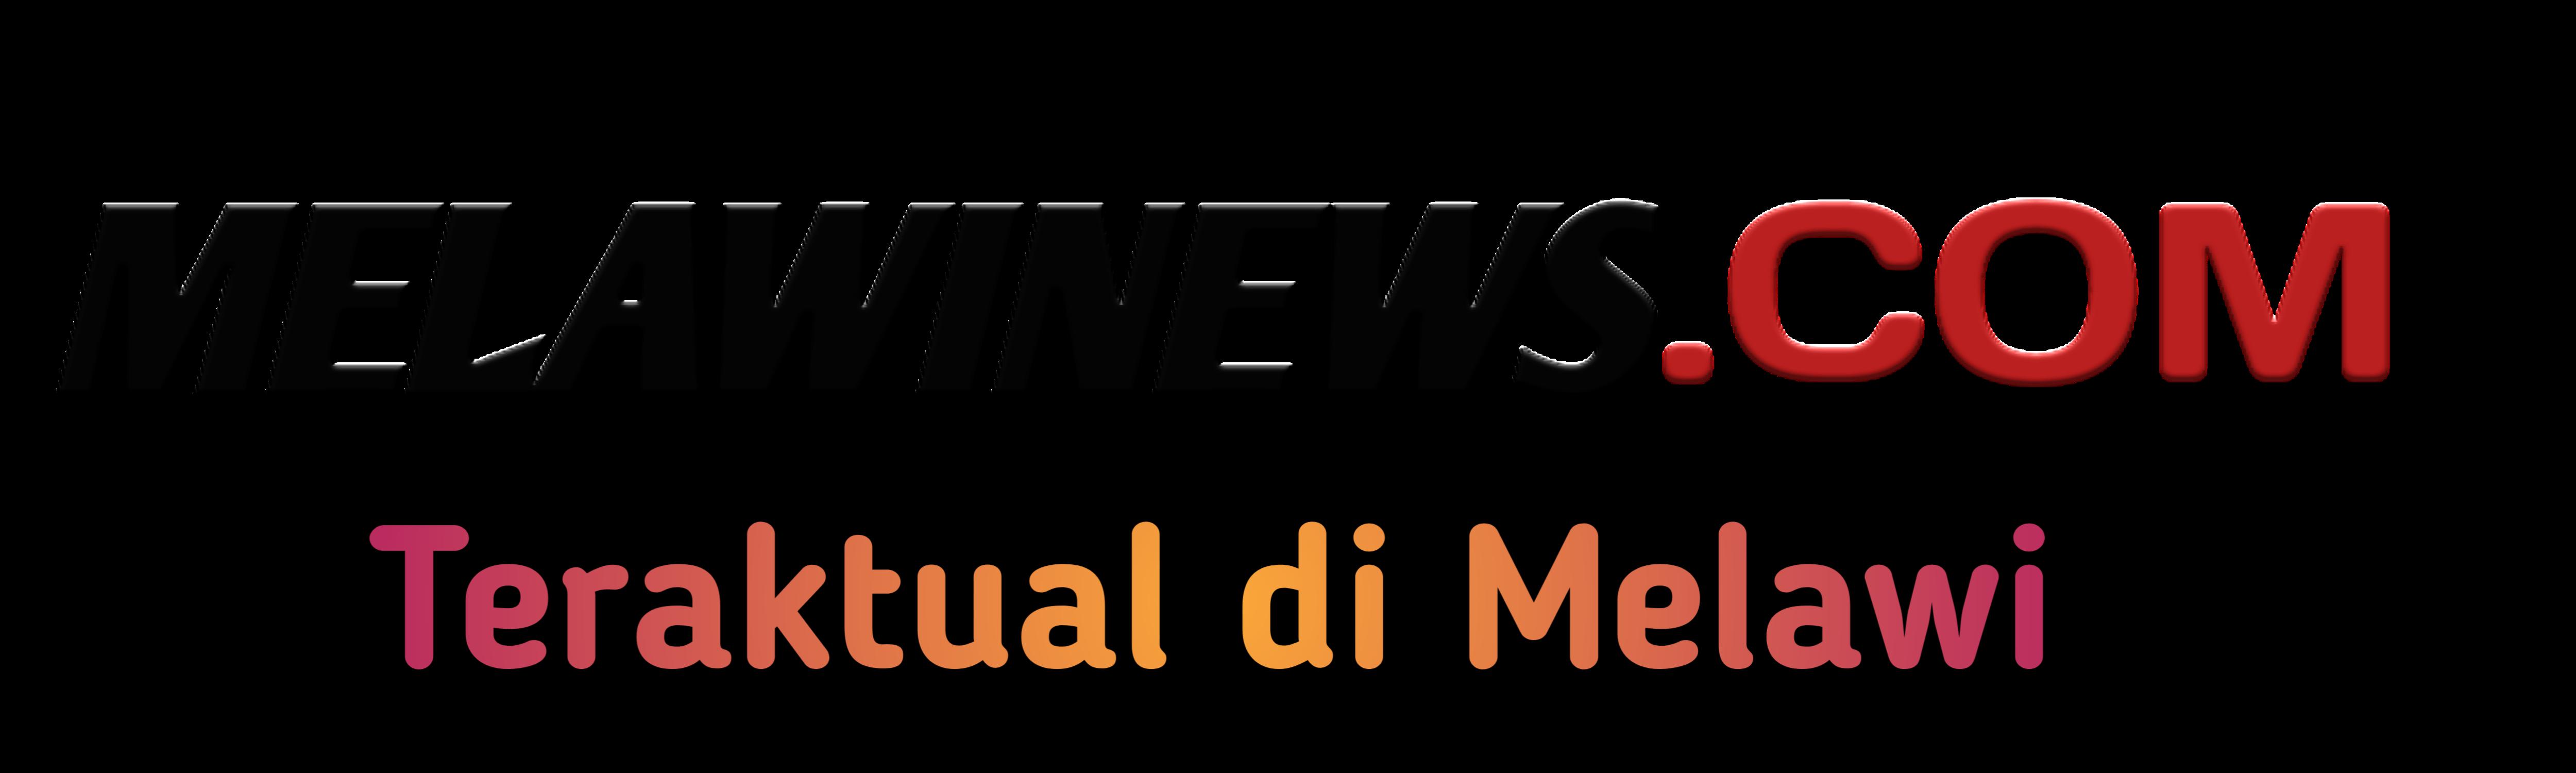 MELAWINEWS.COM